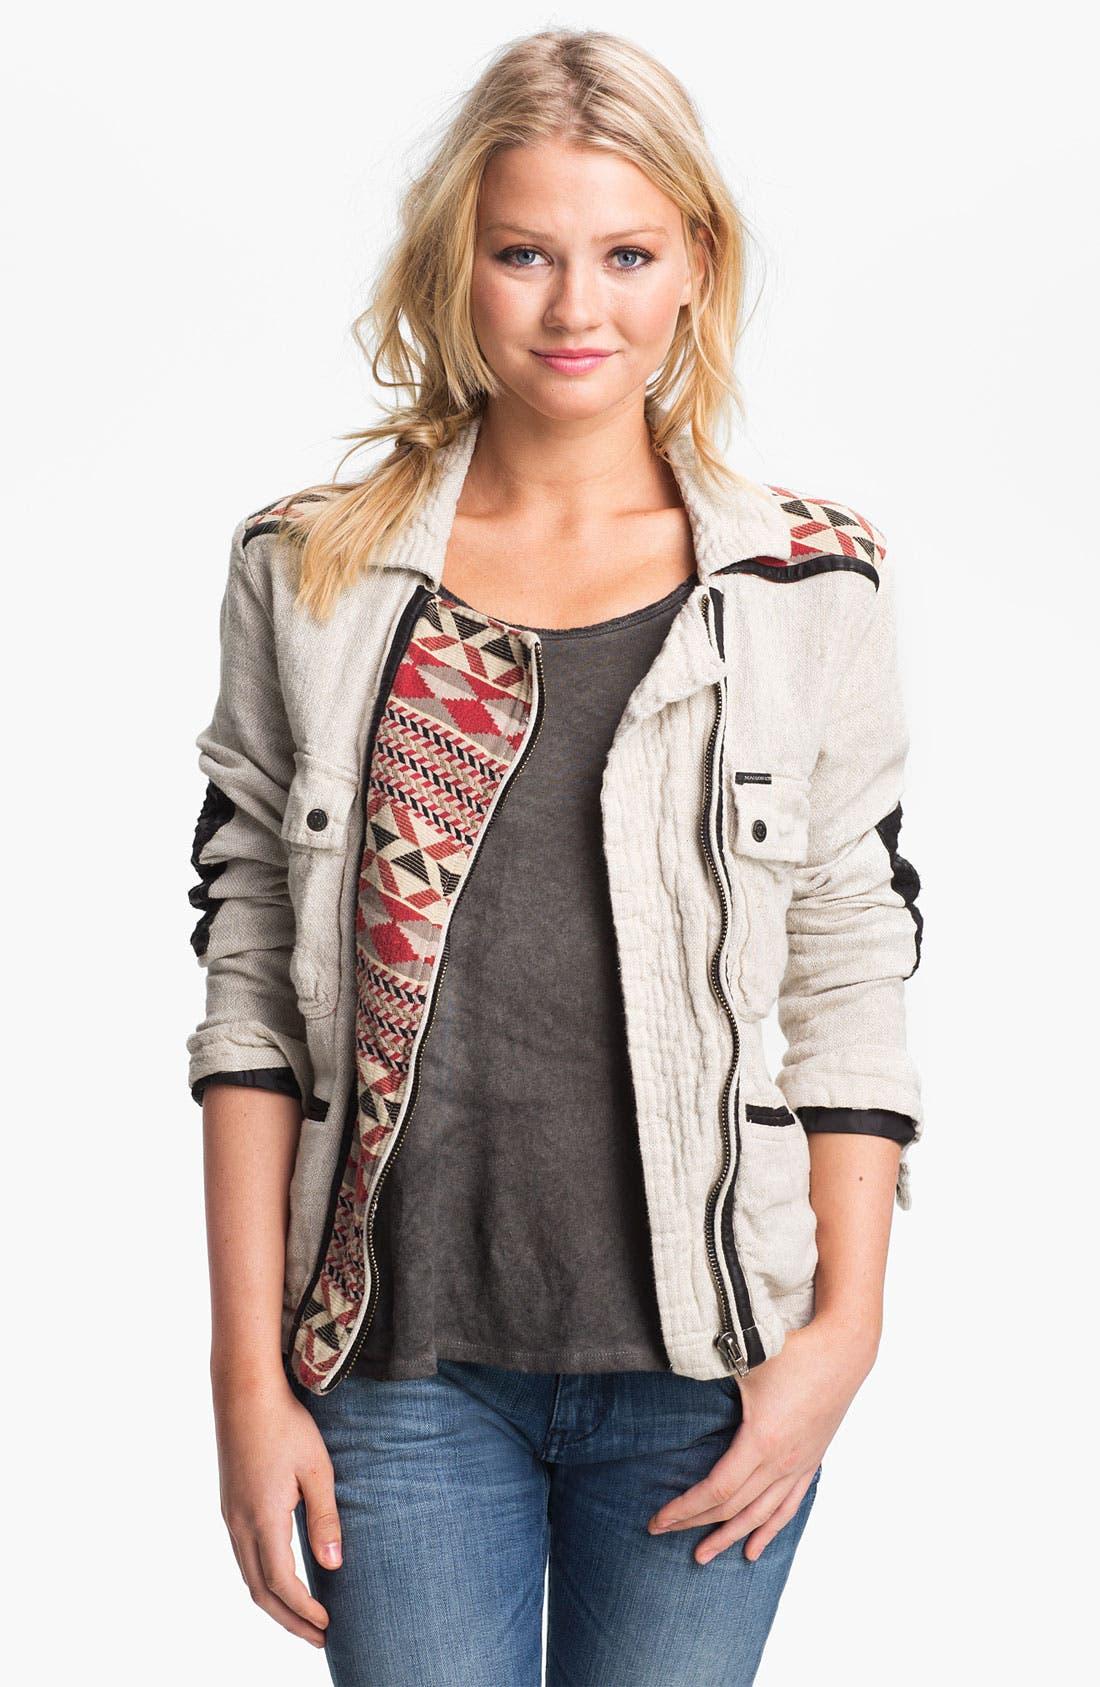 Alternate Image 1 Selected - Maison Scotch Faux Leather & Ikat Trim Field Jacket